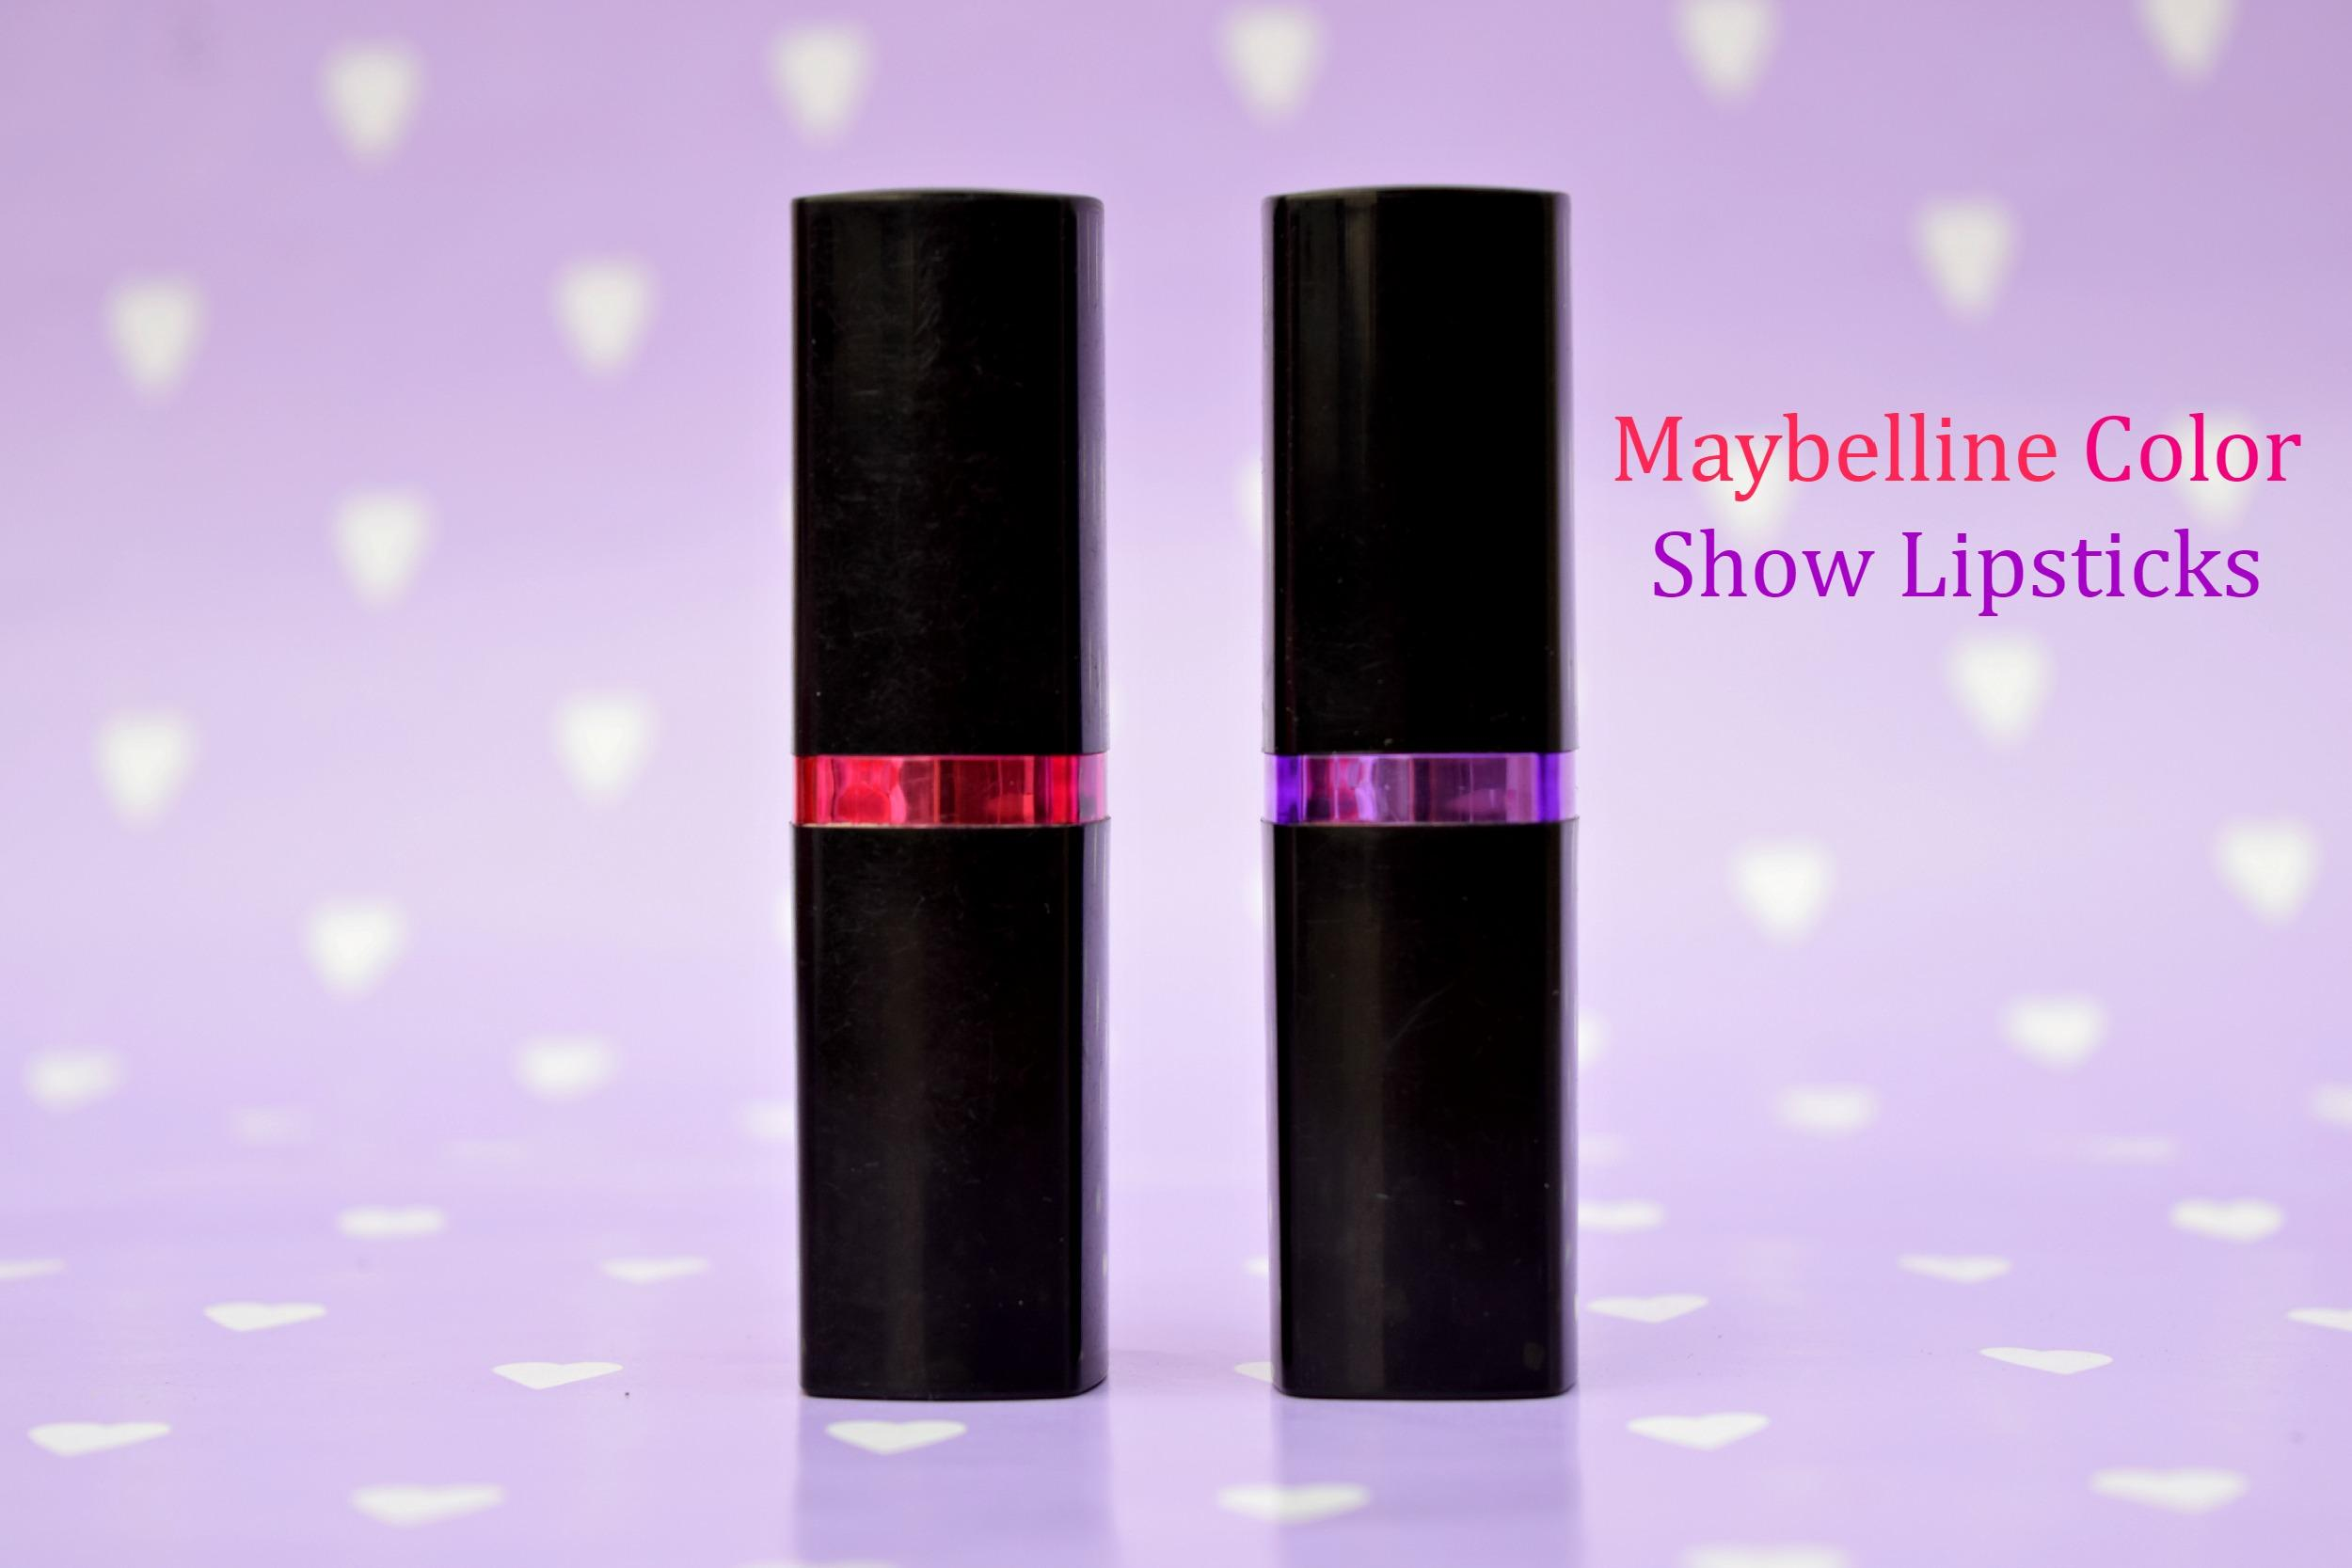 Maybelline Colorshow Lipstick- Burgundy Blend & Fuchsia Flare